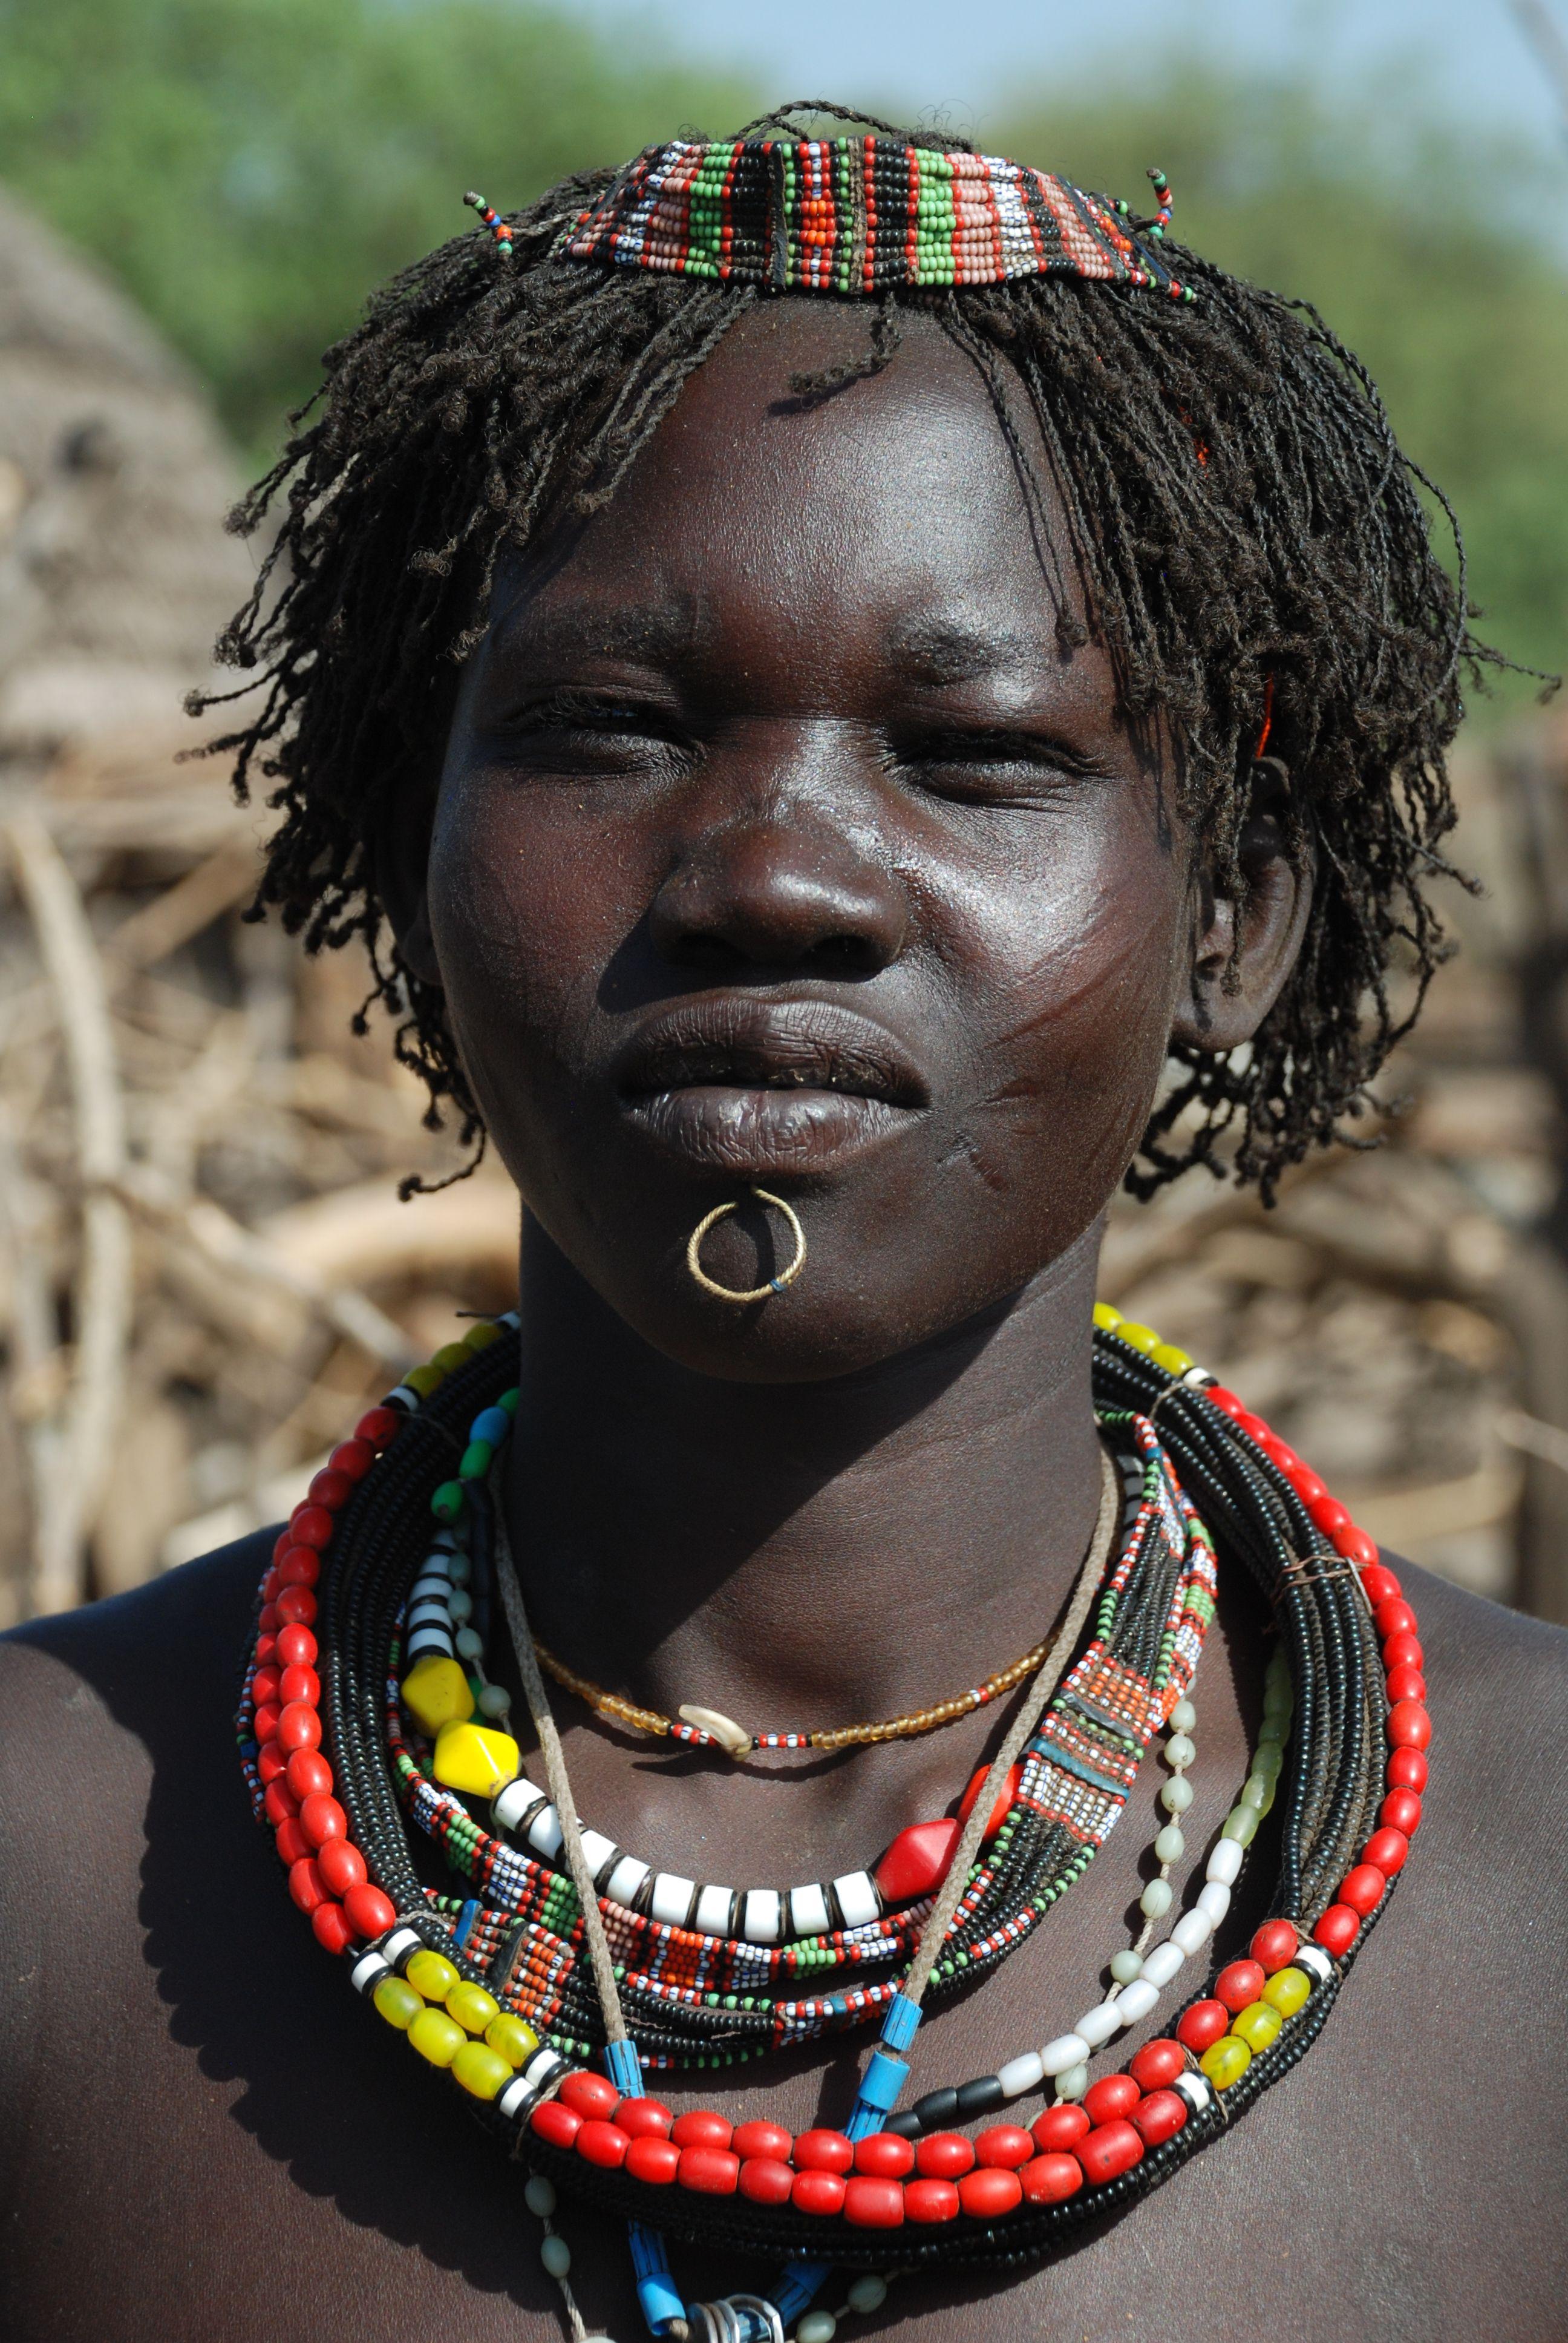 Toposa woman, Kapoeta, South Sudan Faces of Africa